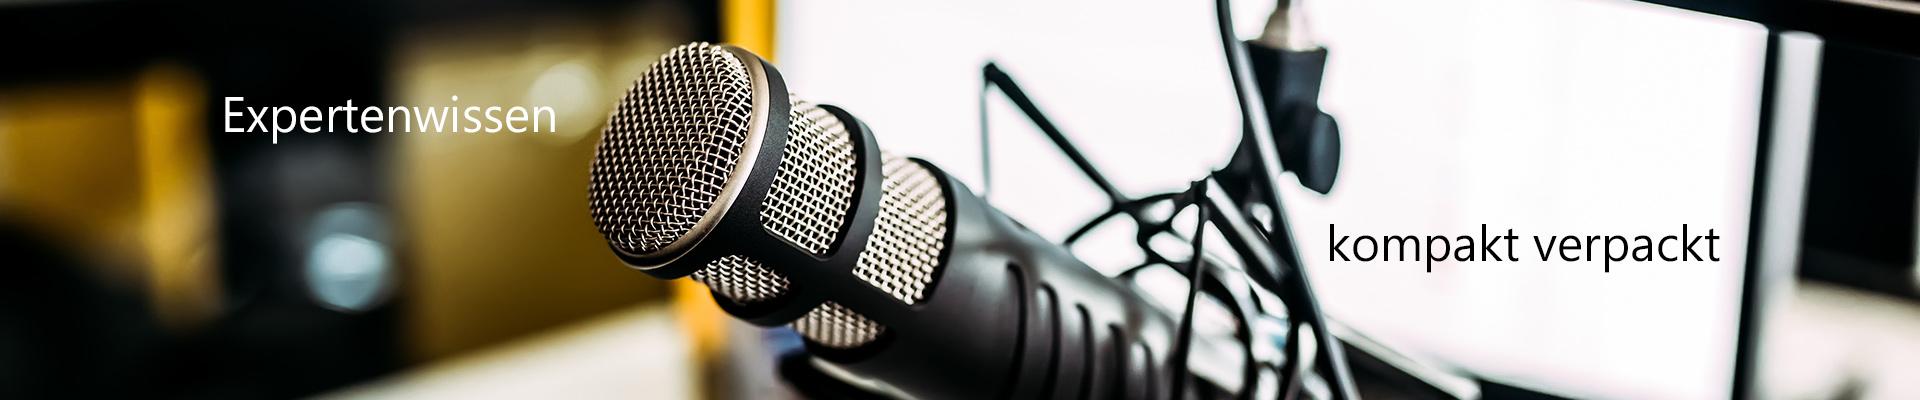 podcast_nortonrsx-iStock